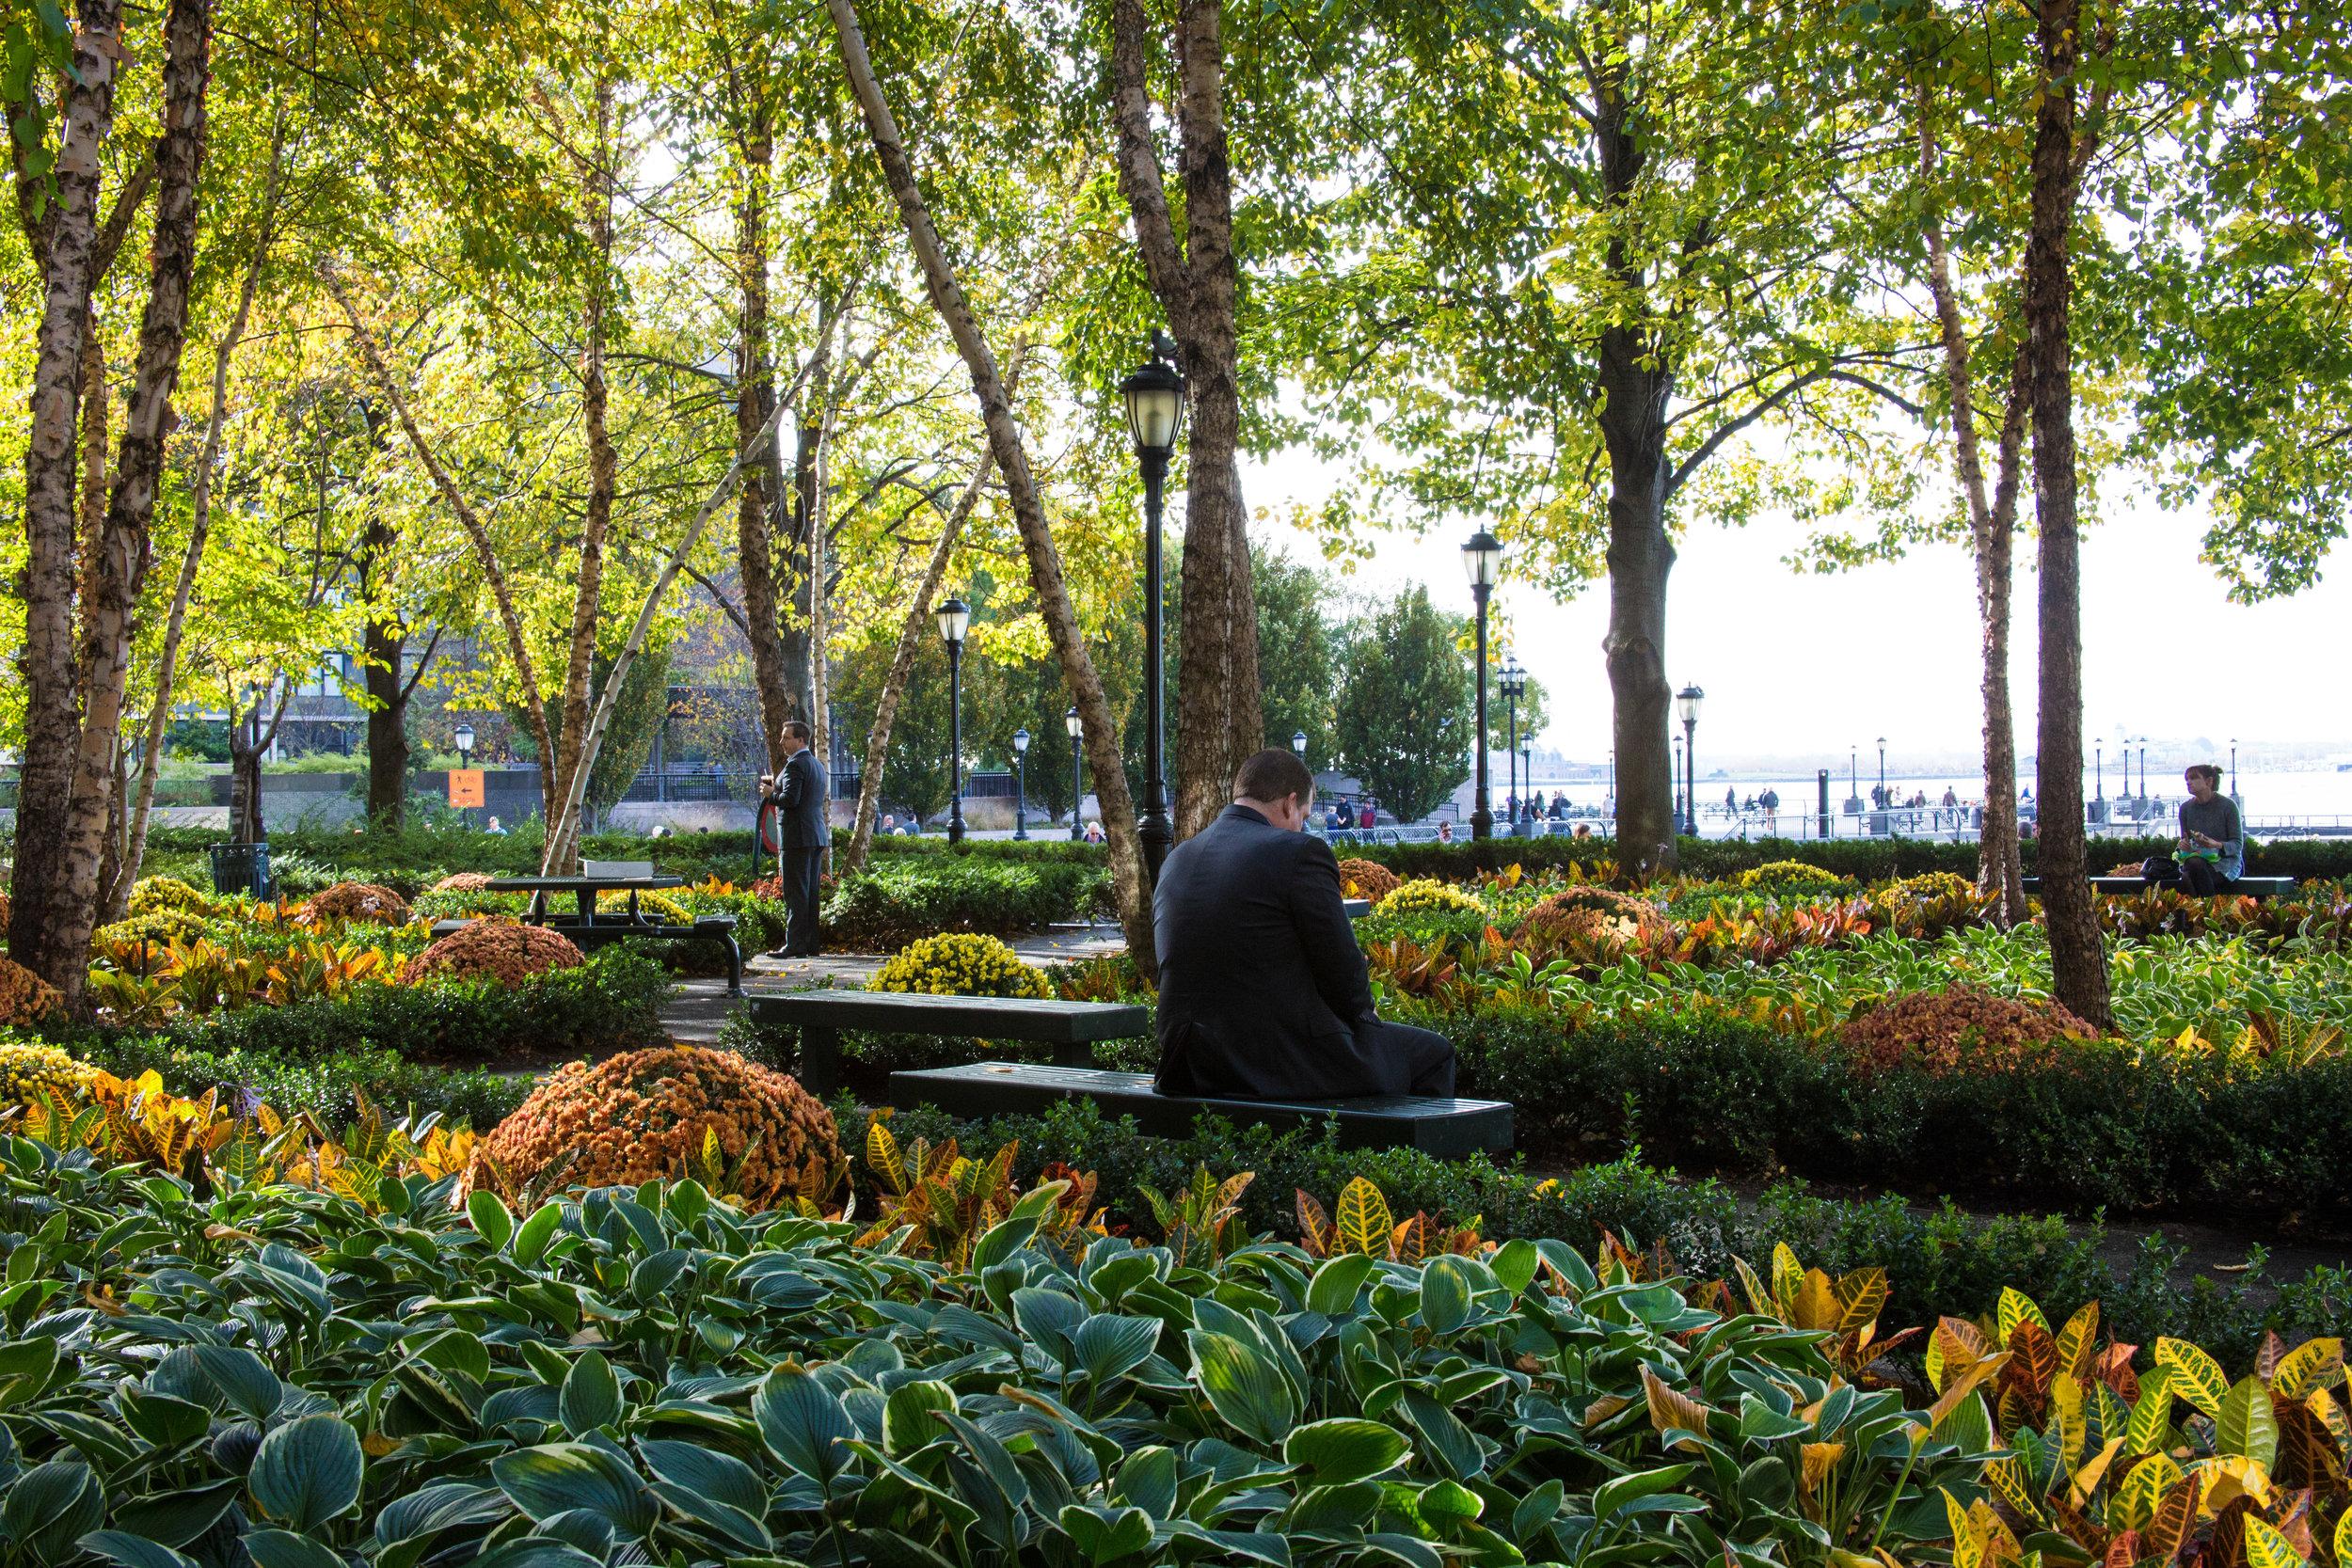 LSNY_Battery-Park-21.jpg